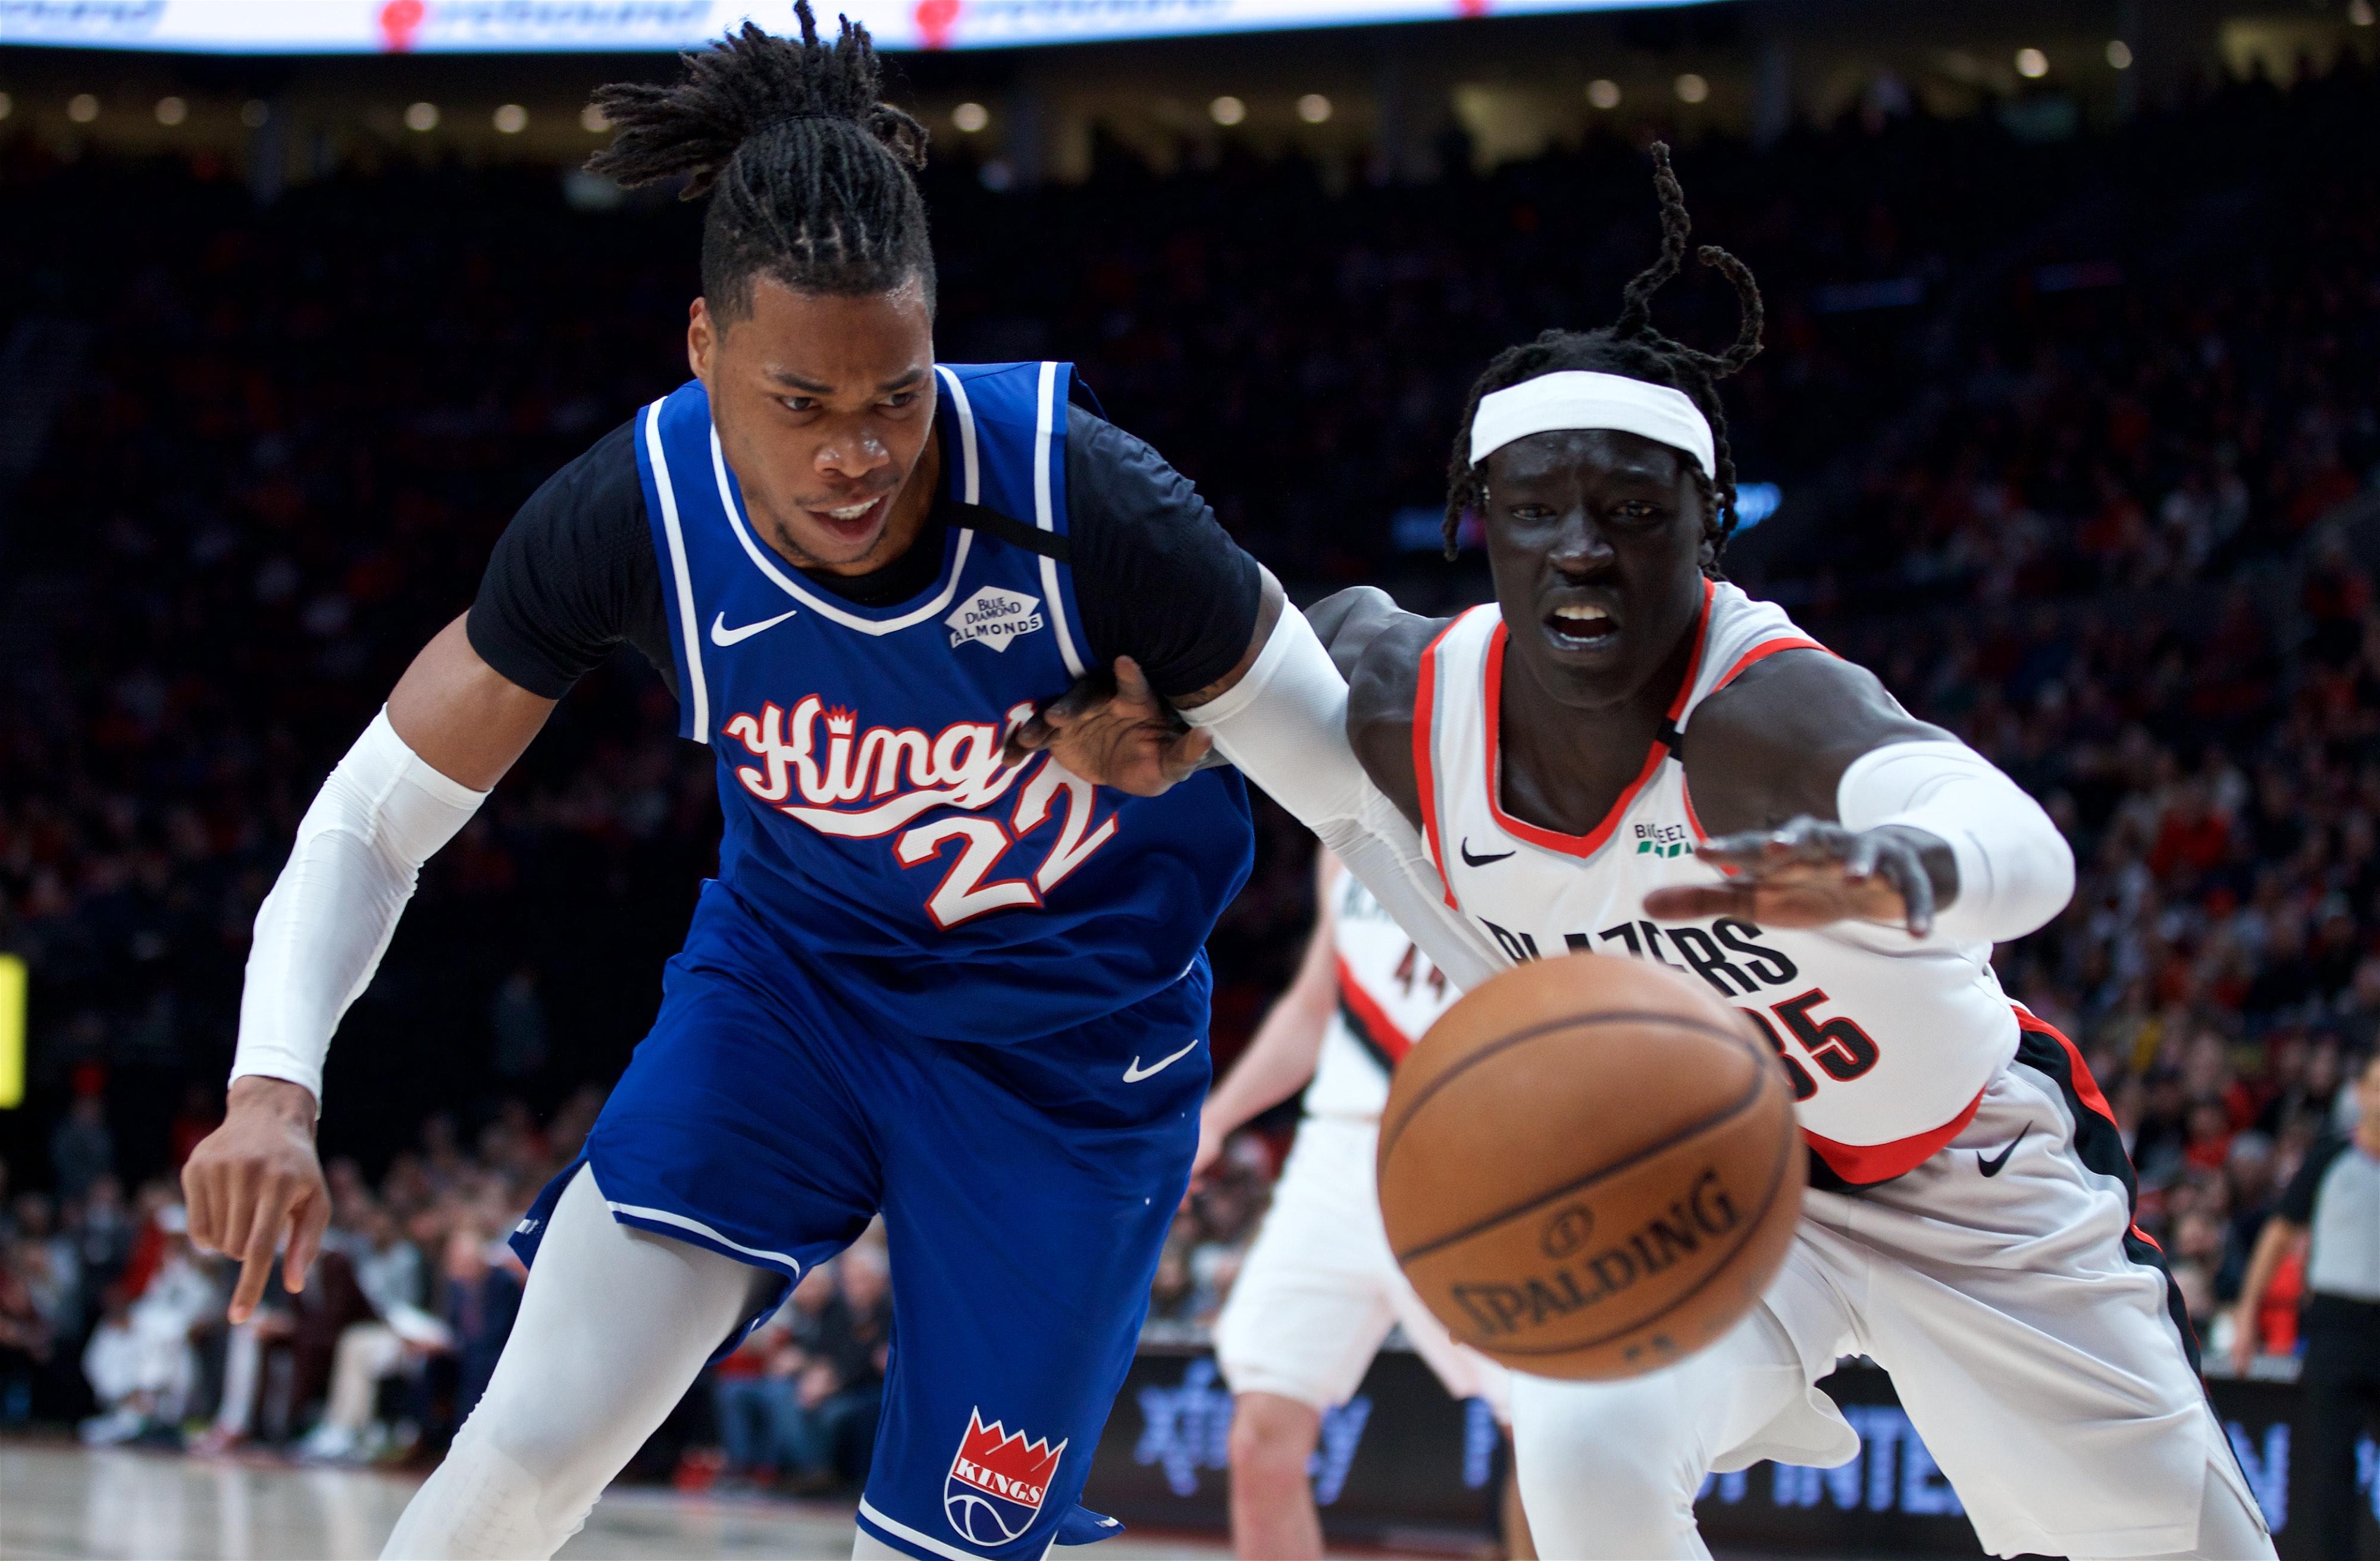 Sacramento Kings center Richaun Holmes and Portland Trail Blazers forward Wenyen Gabriel reach for a loose ball during the second quarter at the Moda Center.